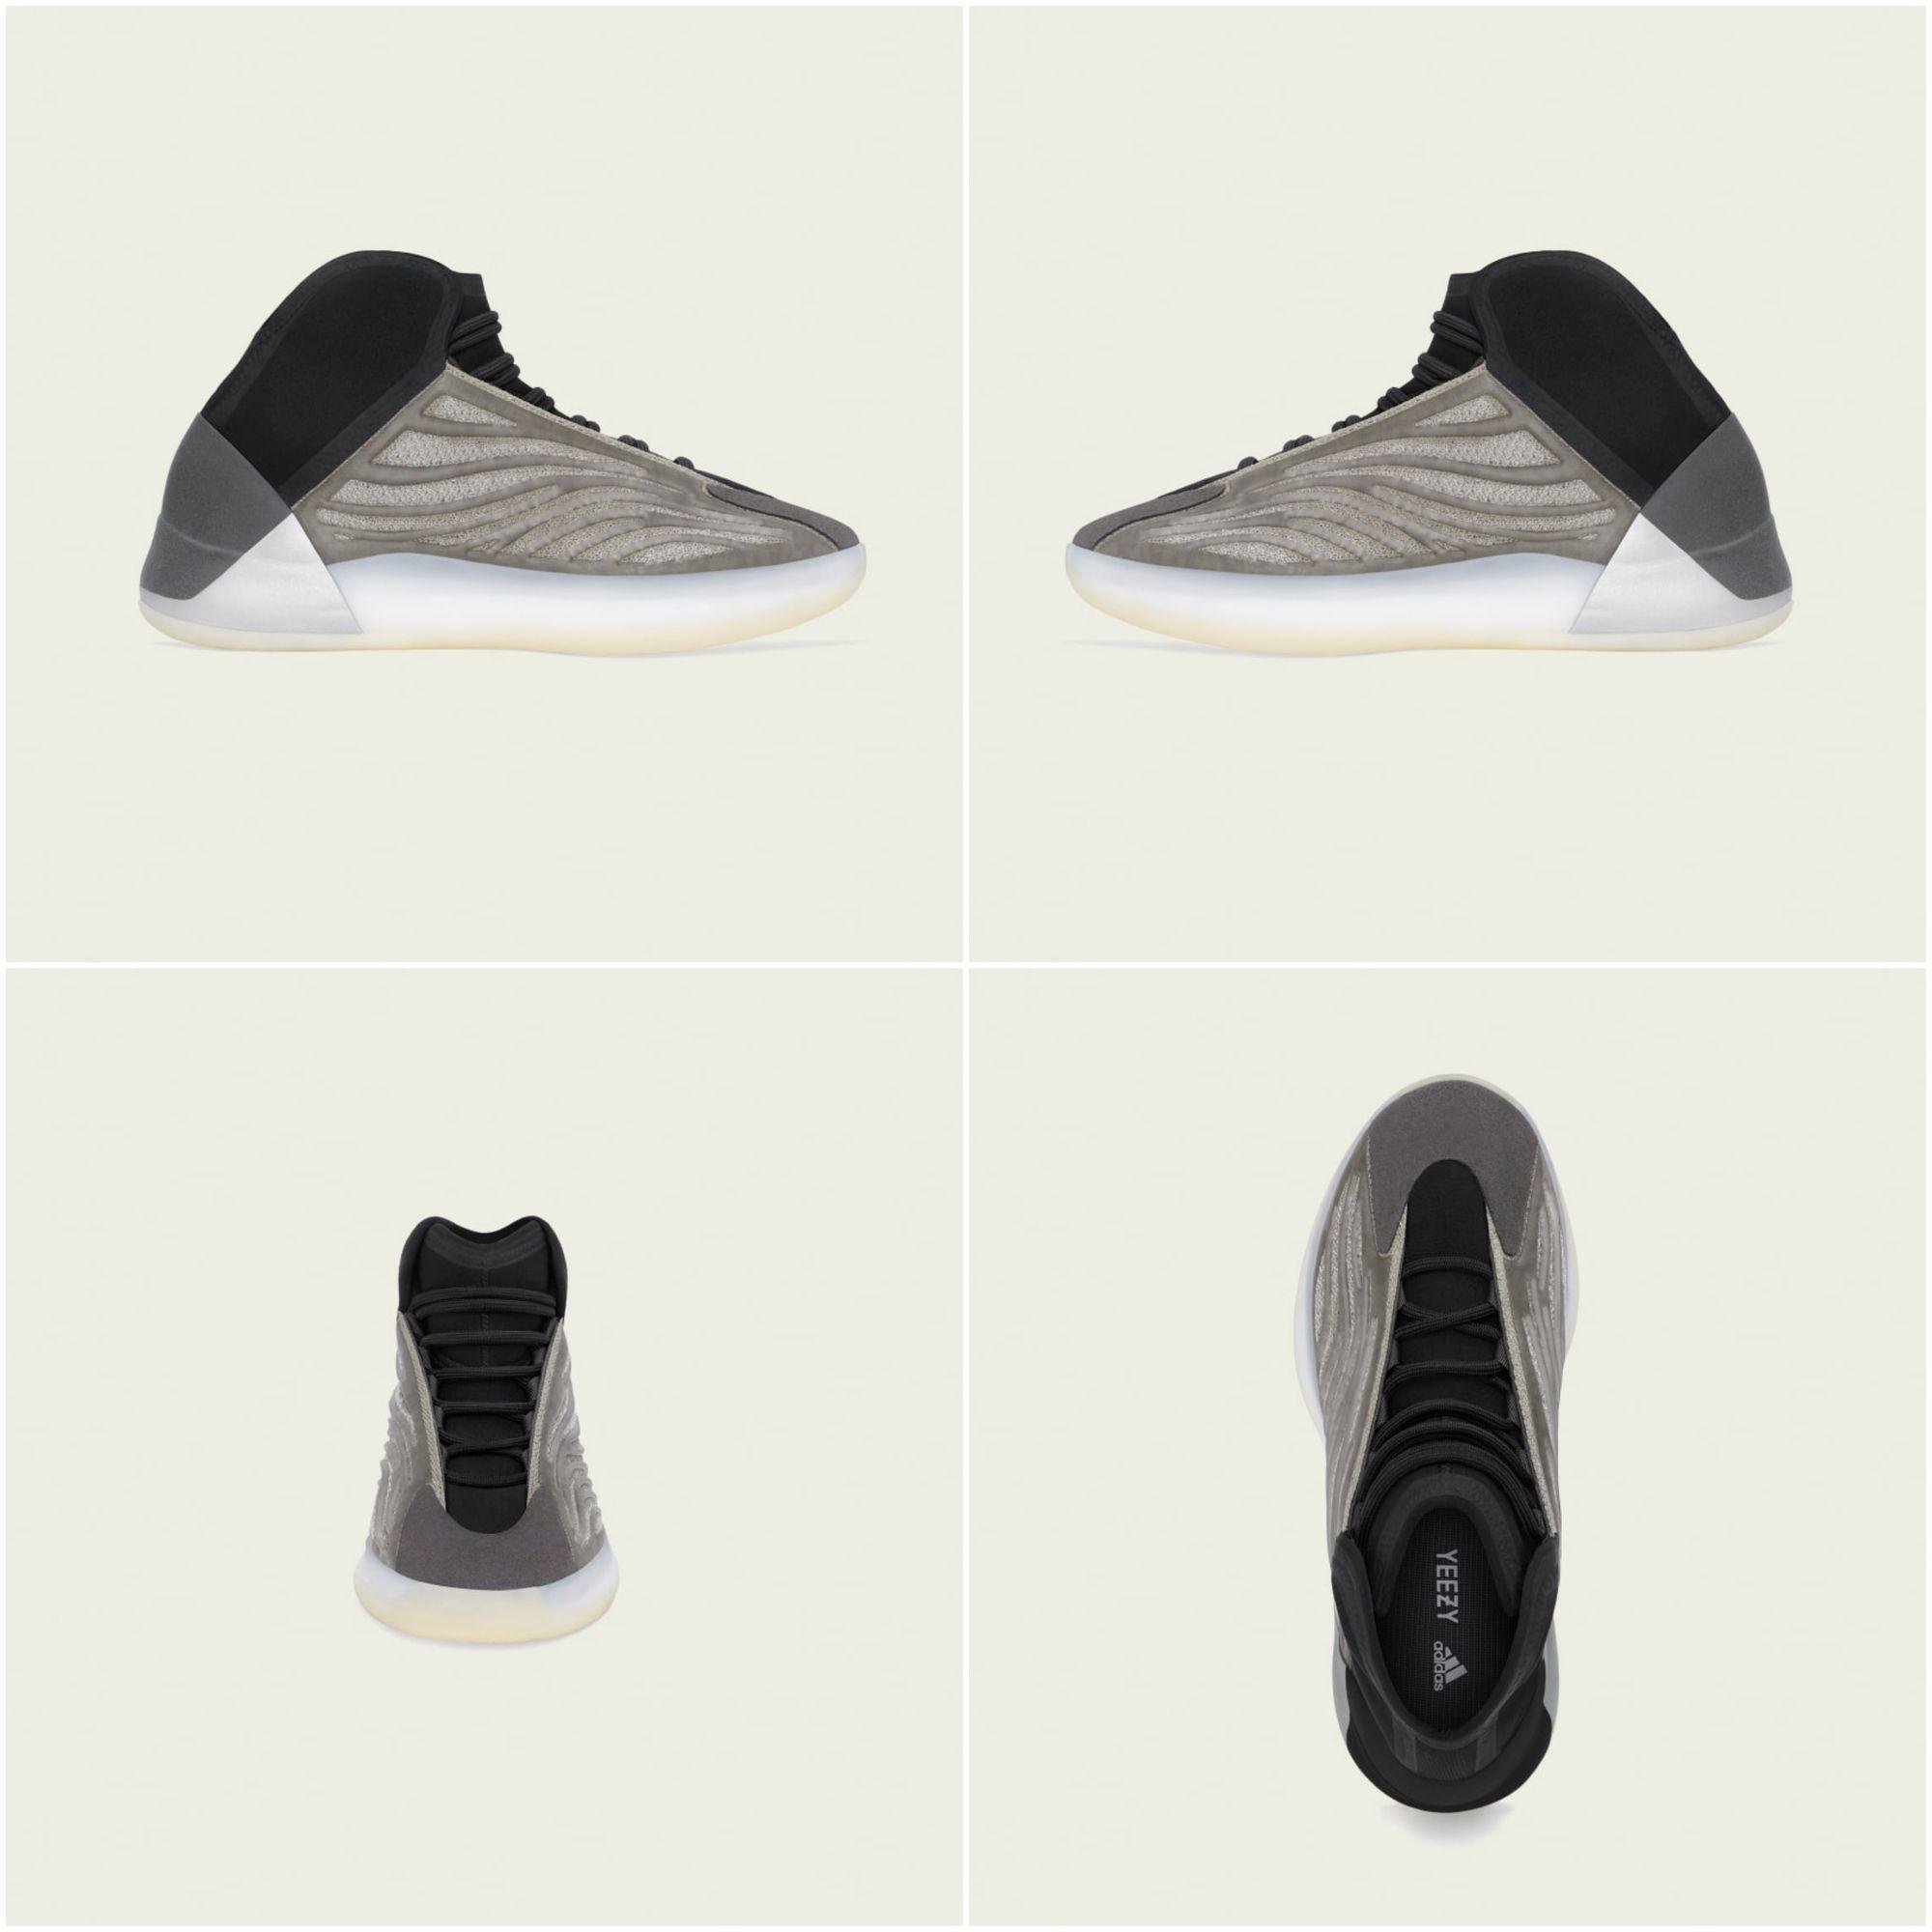 Adidas Yeezy Qntm Barium In 2020 Adidas Yeezy Sneakers Yeezy